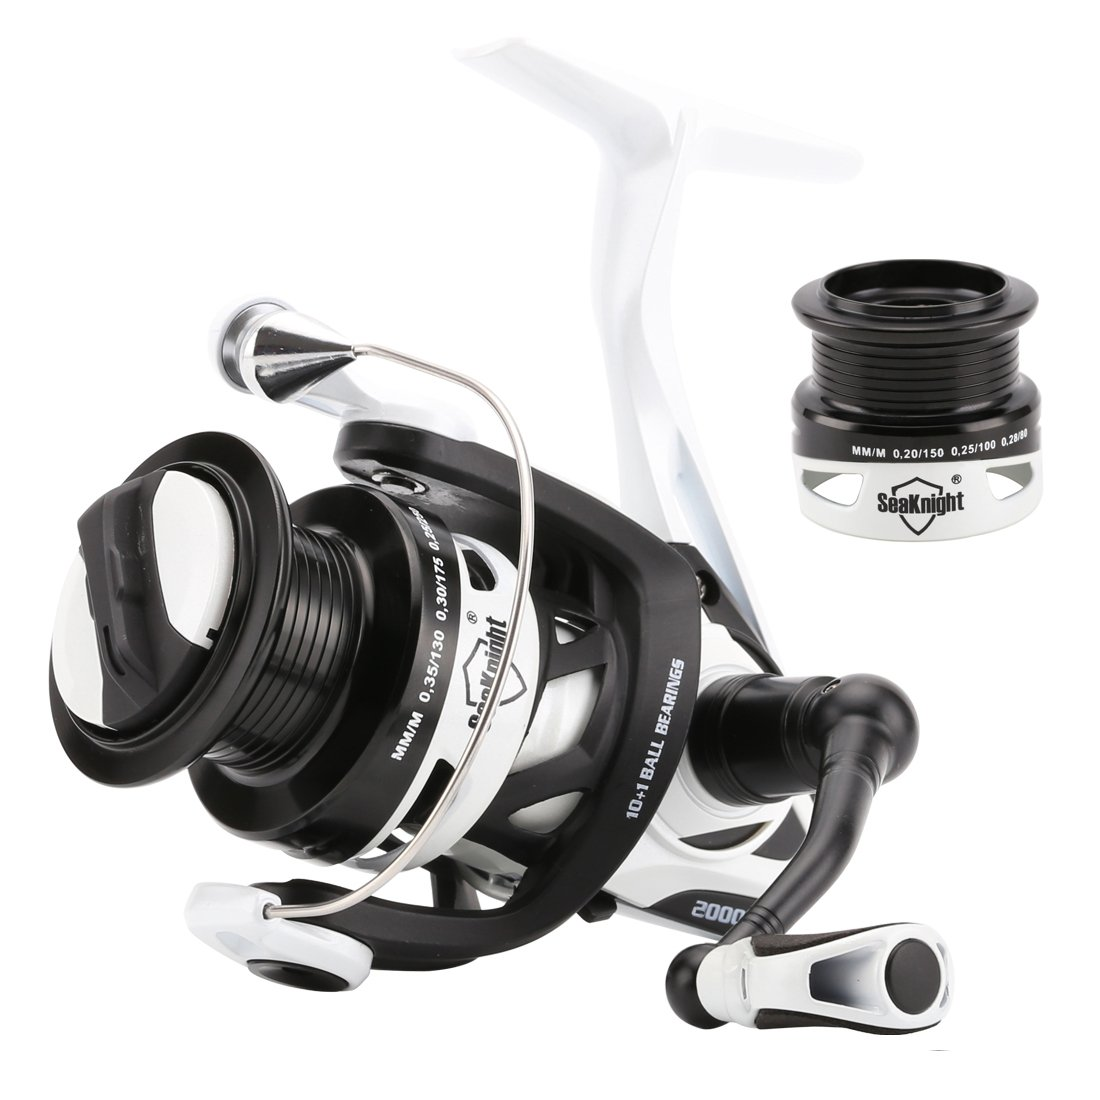 SeaKnight Ph Spinning Reelメタルボディカーボンローター6.2 : 1 Spinning釣りリール高速かつ強力withメタルShallowスペアスプール  6.2:1 Reel-Phantom2000H+Spool B01KLS4KTM